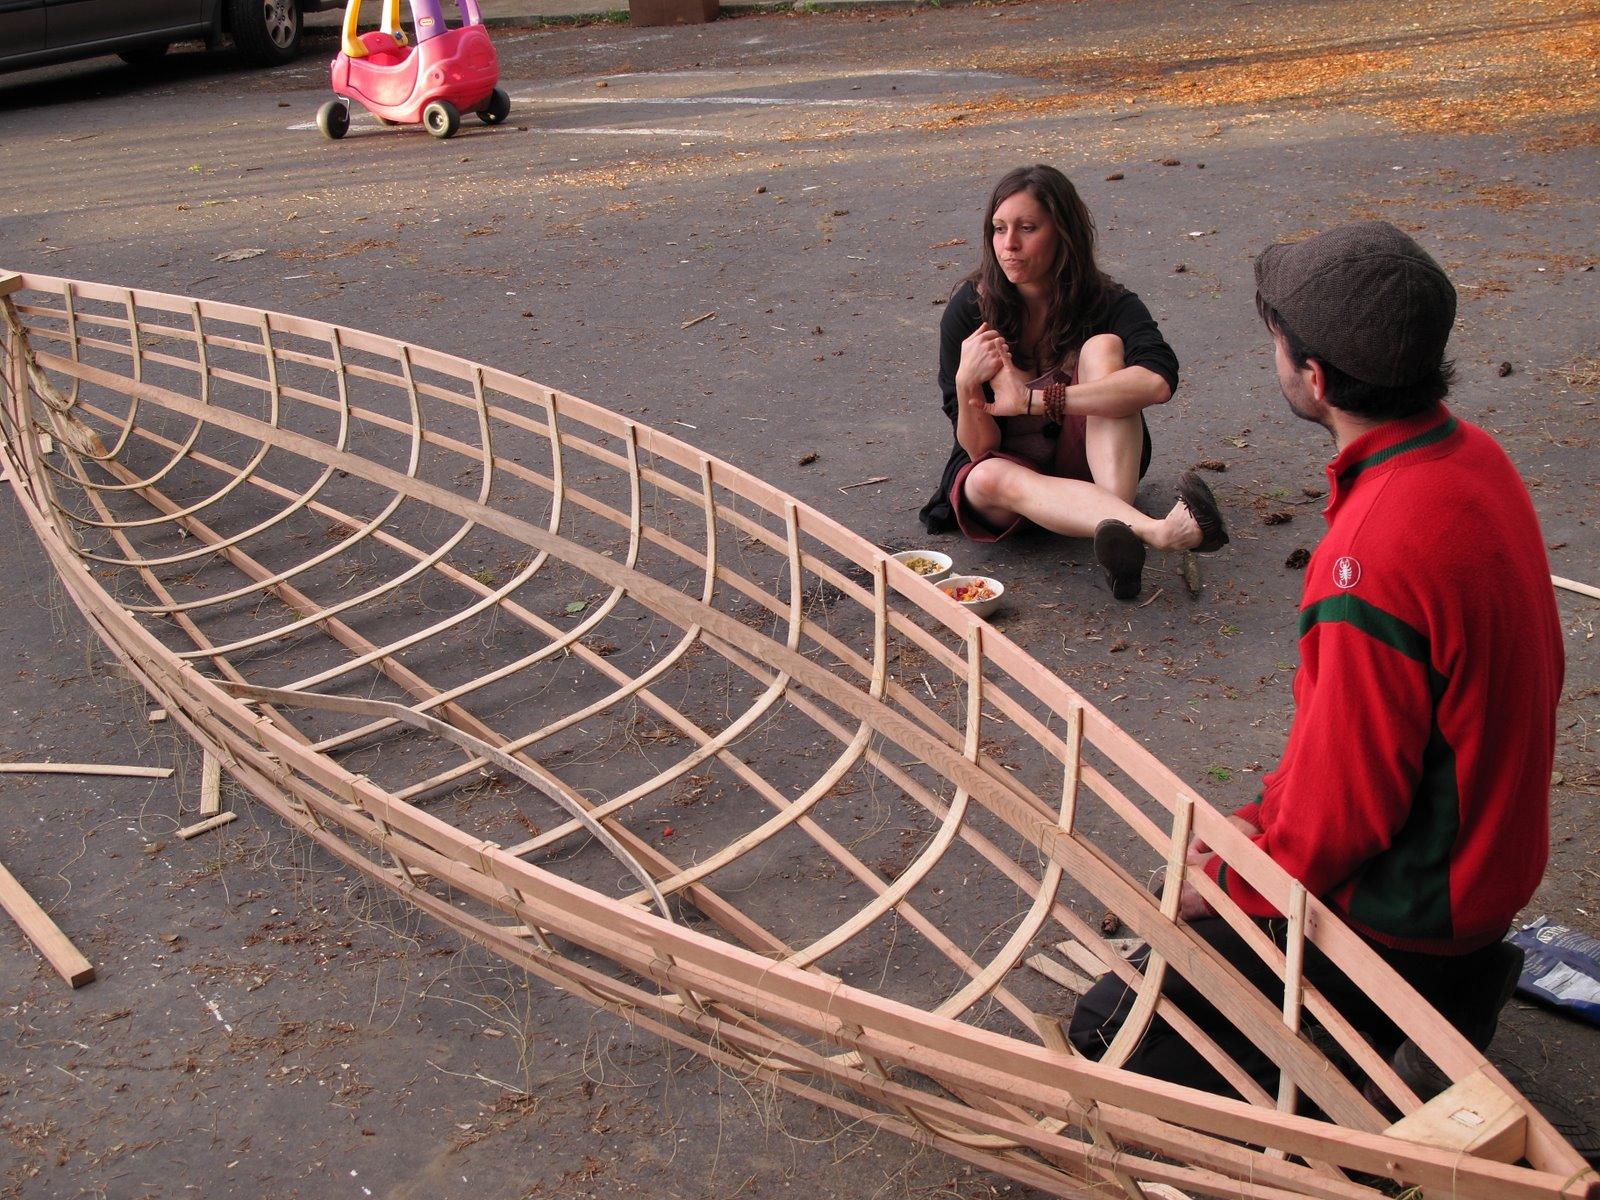 White boat: Free skin on frame canoe kits